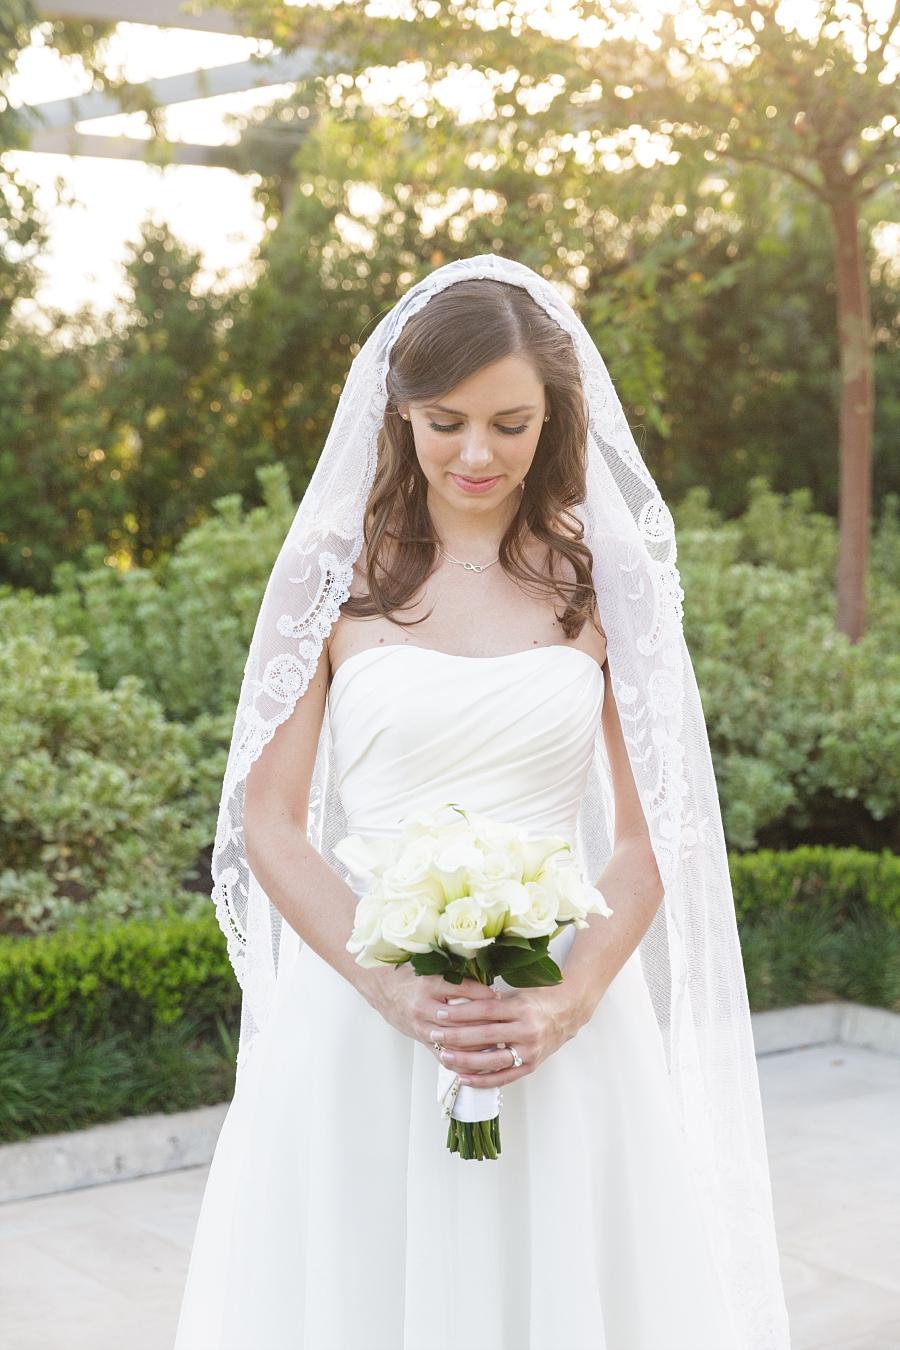 Stacy-Anderson-Photography-McGovern-Centennial-Gardens-Houston-Wedding-Photographer_0051.jpg